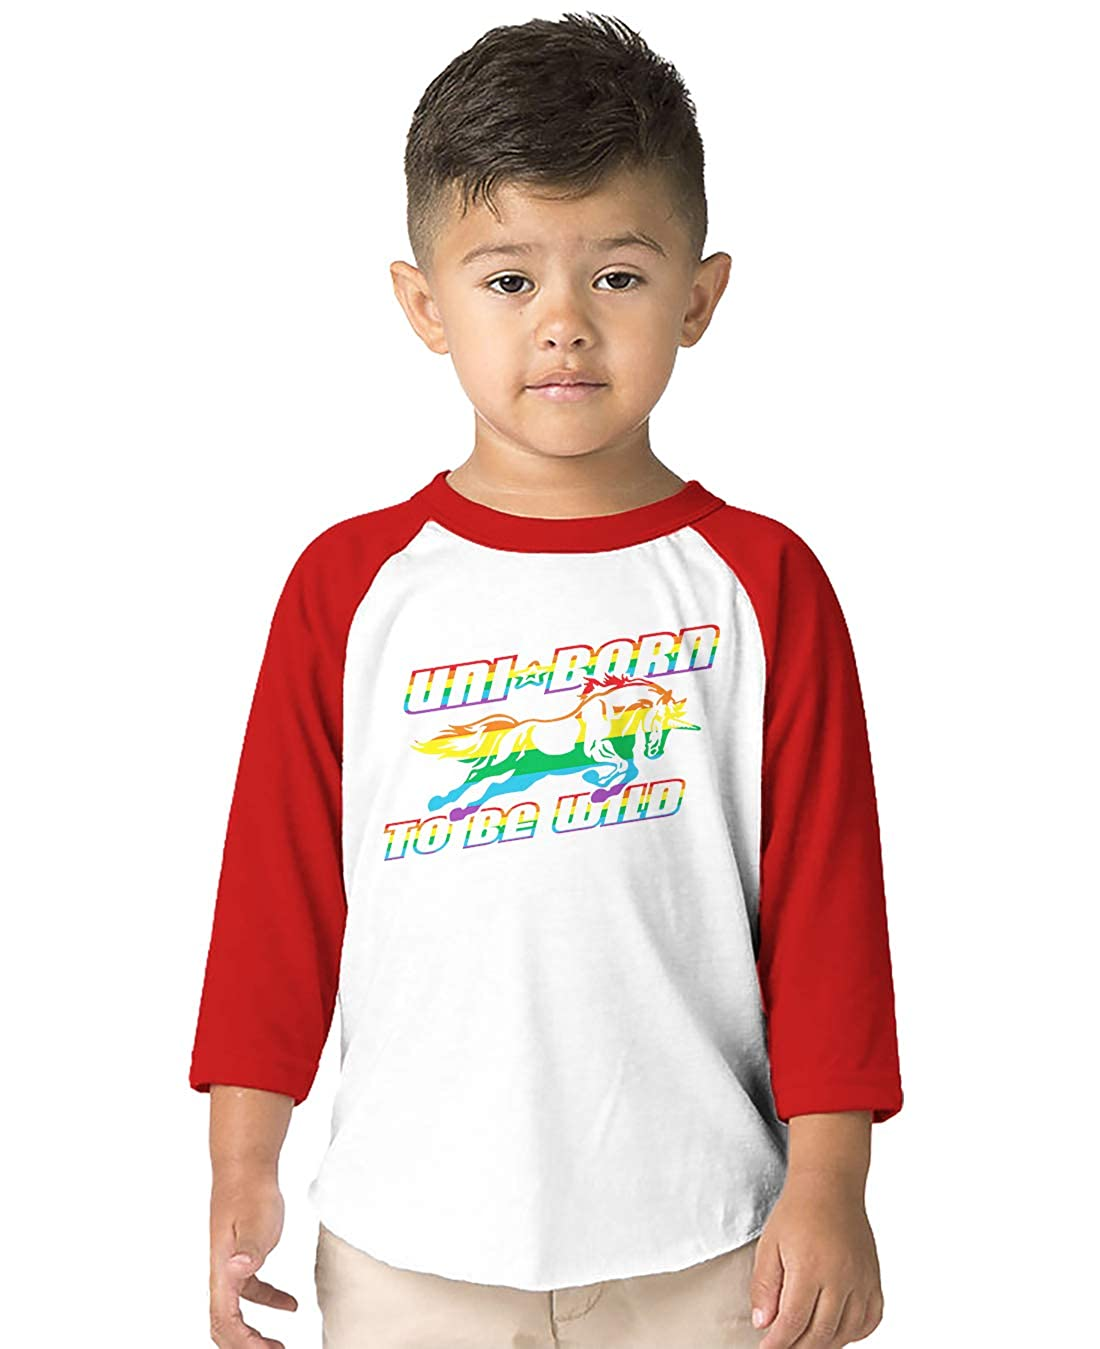 Unicorn Magical Toddler 3//4 Raglan Shirt SpiritForged Apparel Uni Born to Be Wild